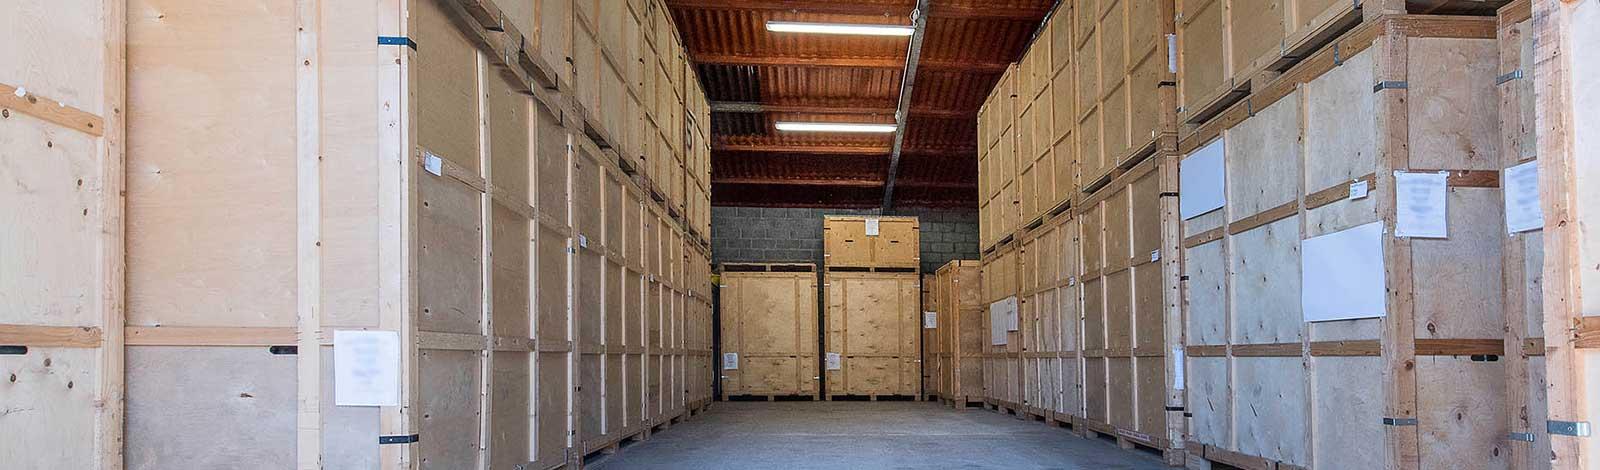 Storage in Jersey